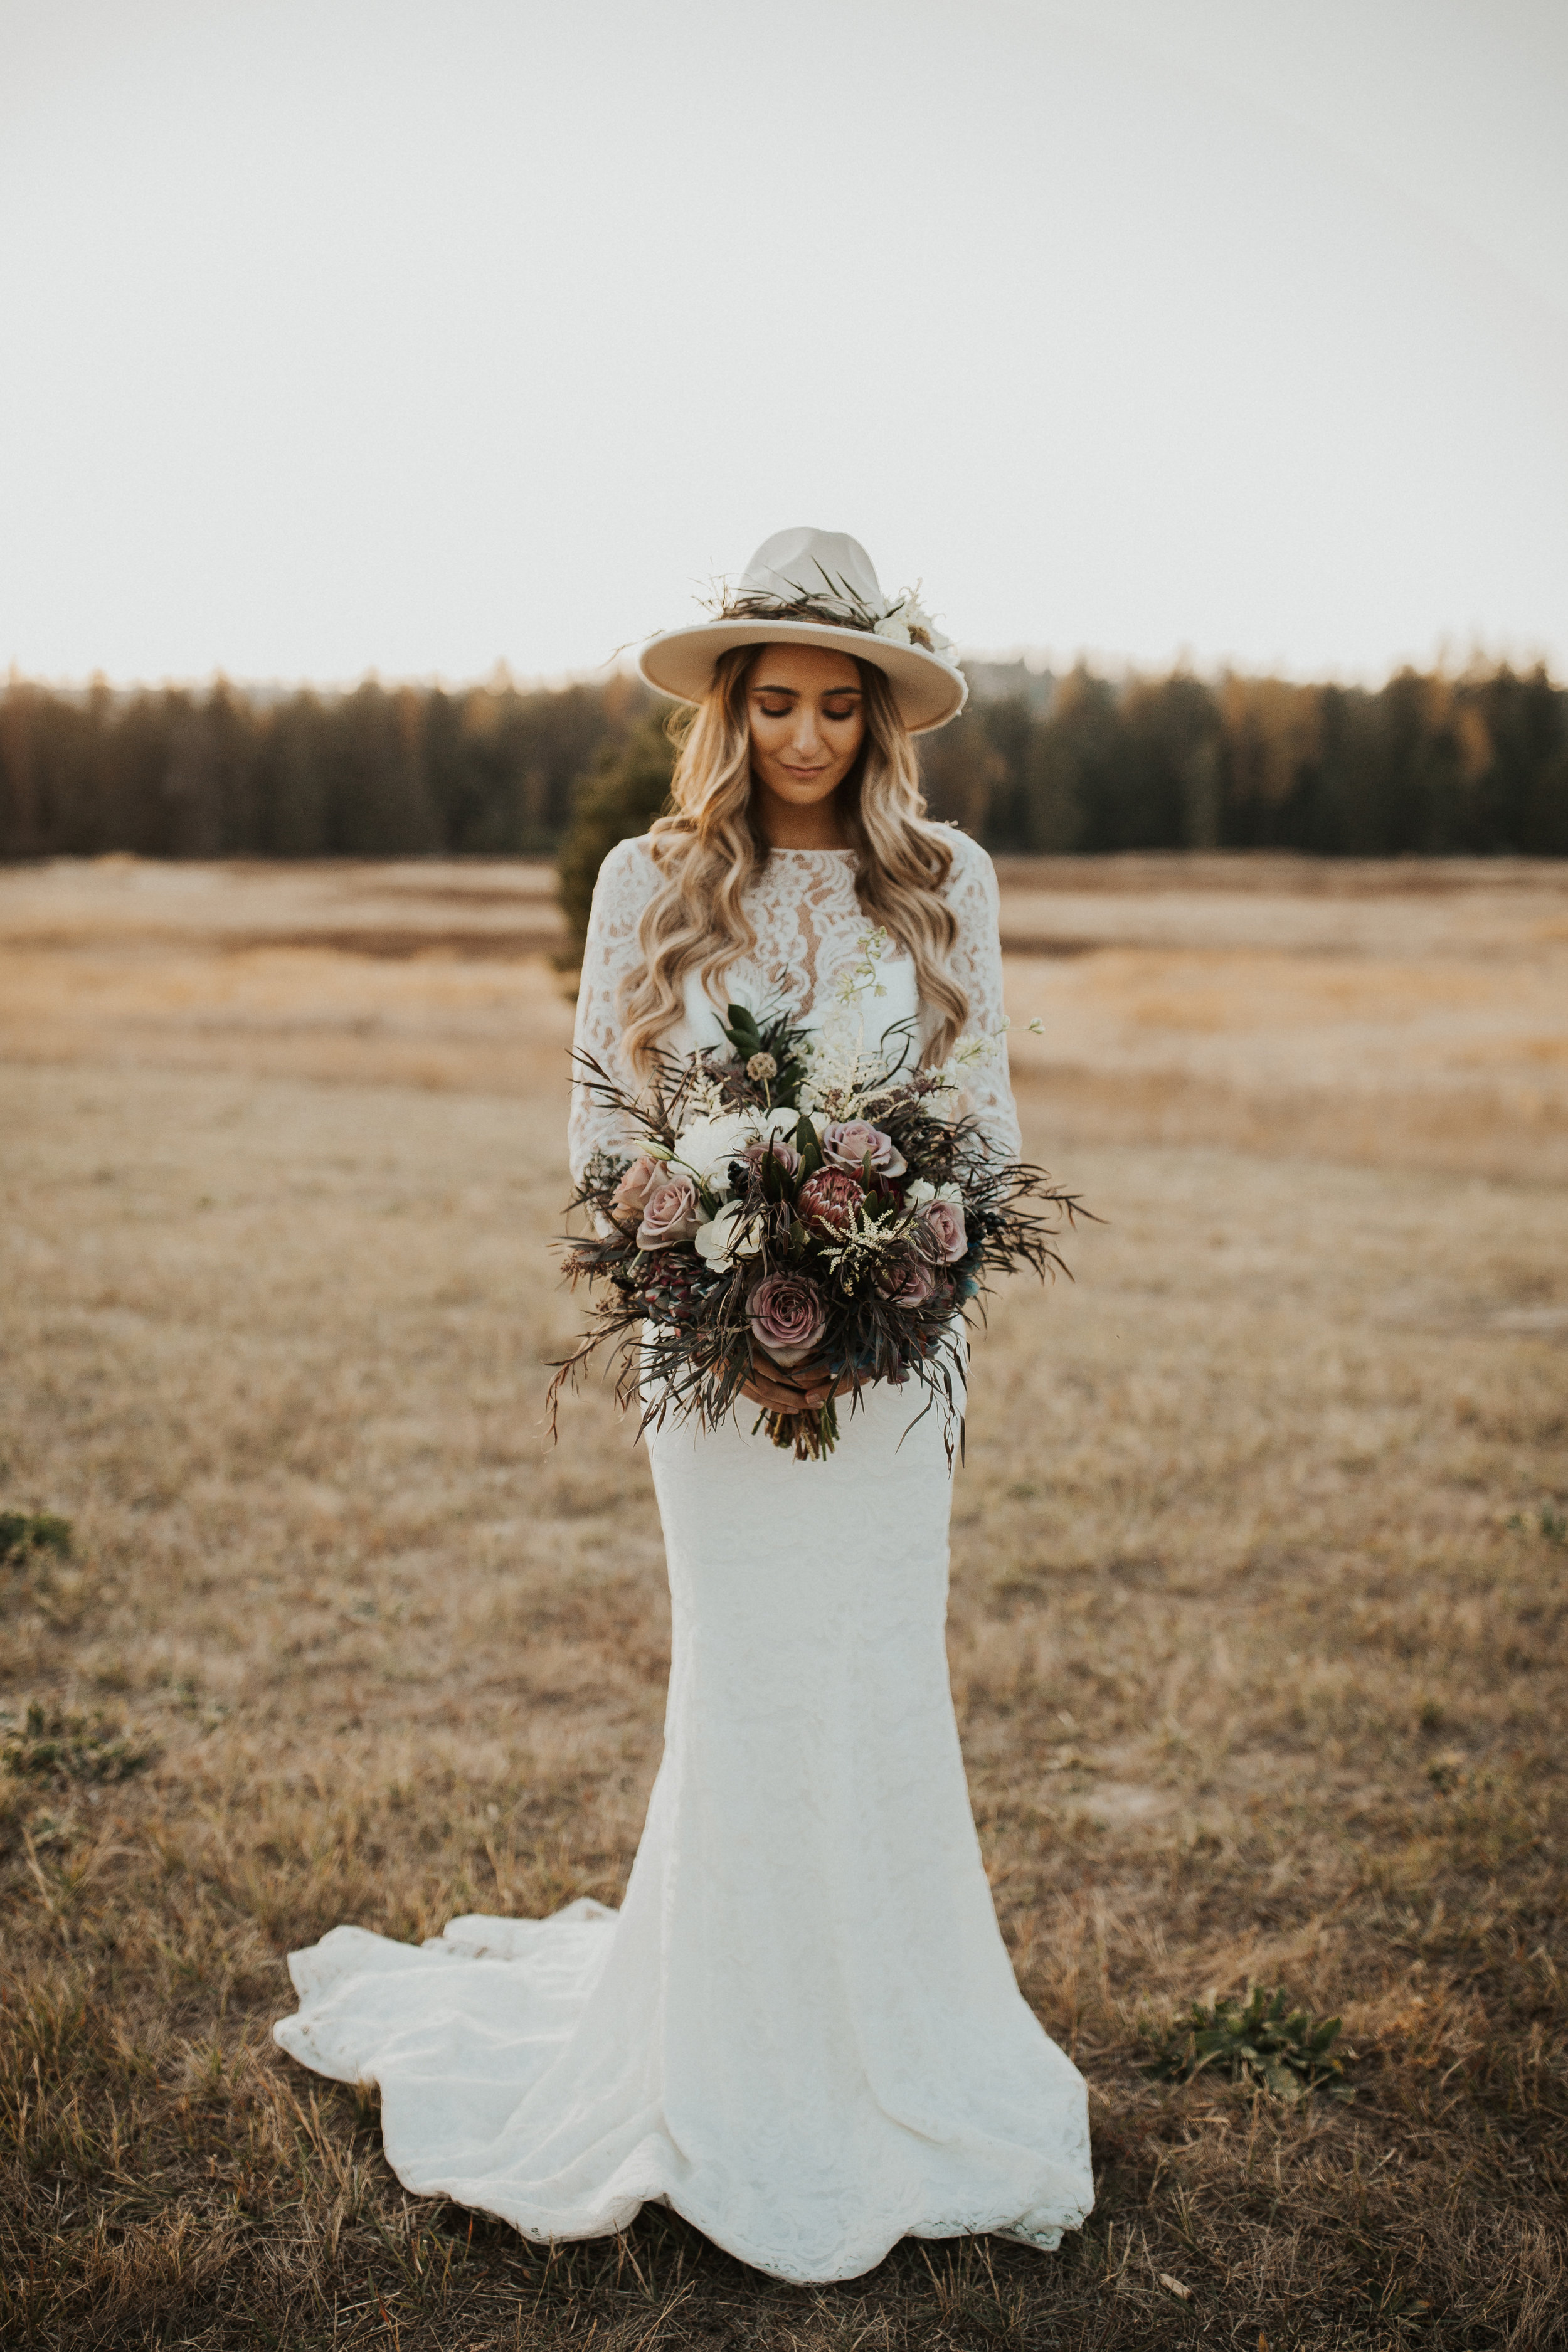 Mt Spokane bridal photoshoot bridal hat